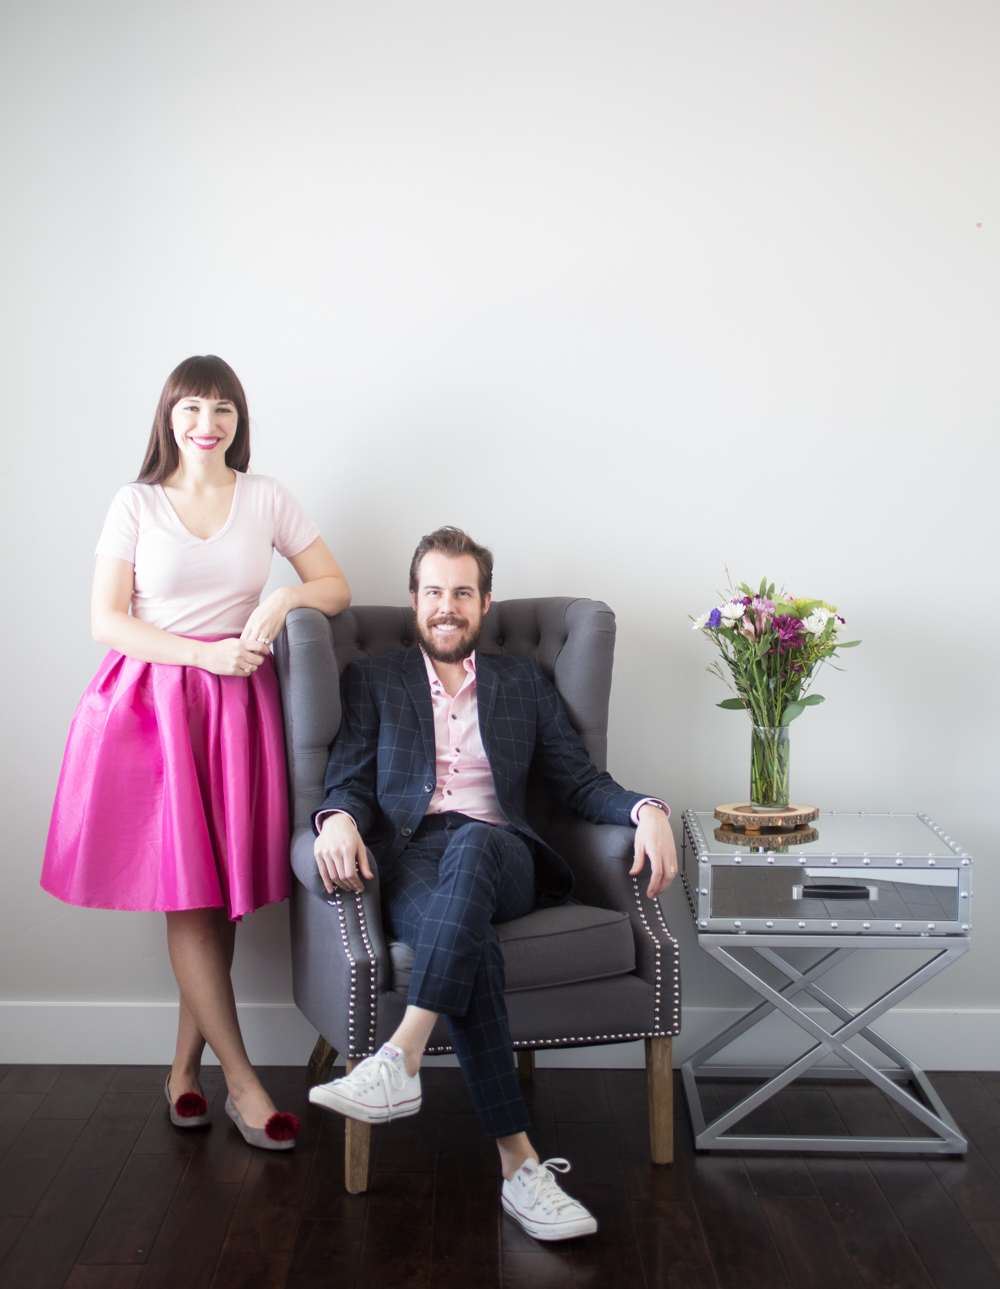 Wayfair.com Furniture Review